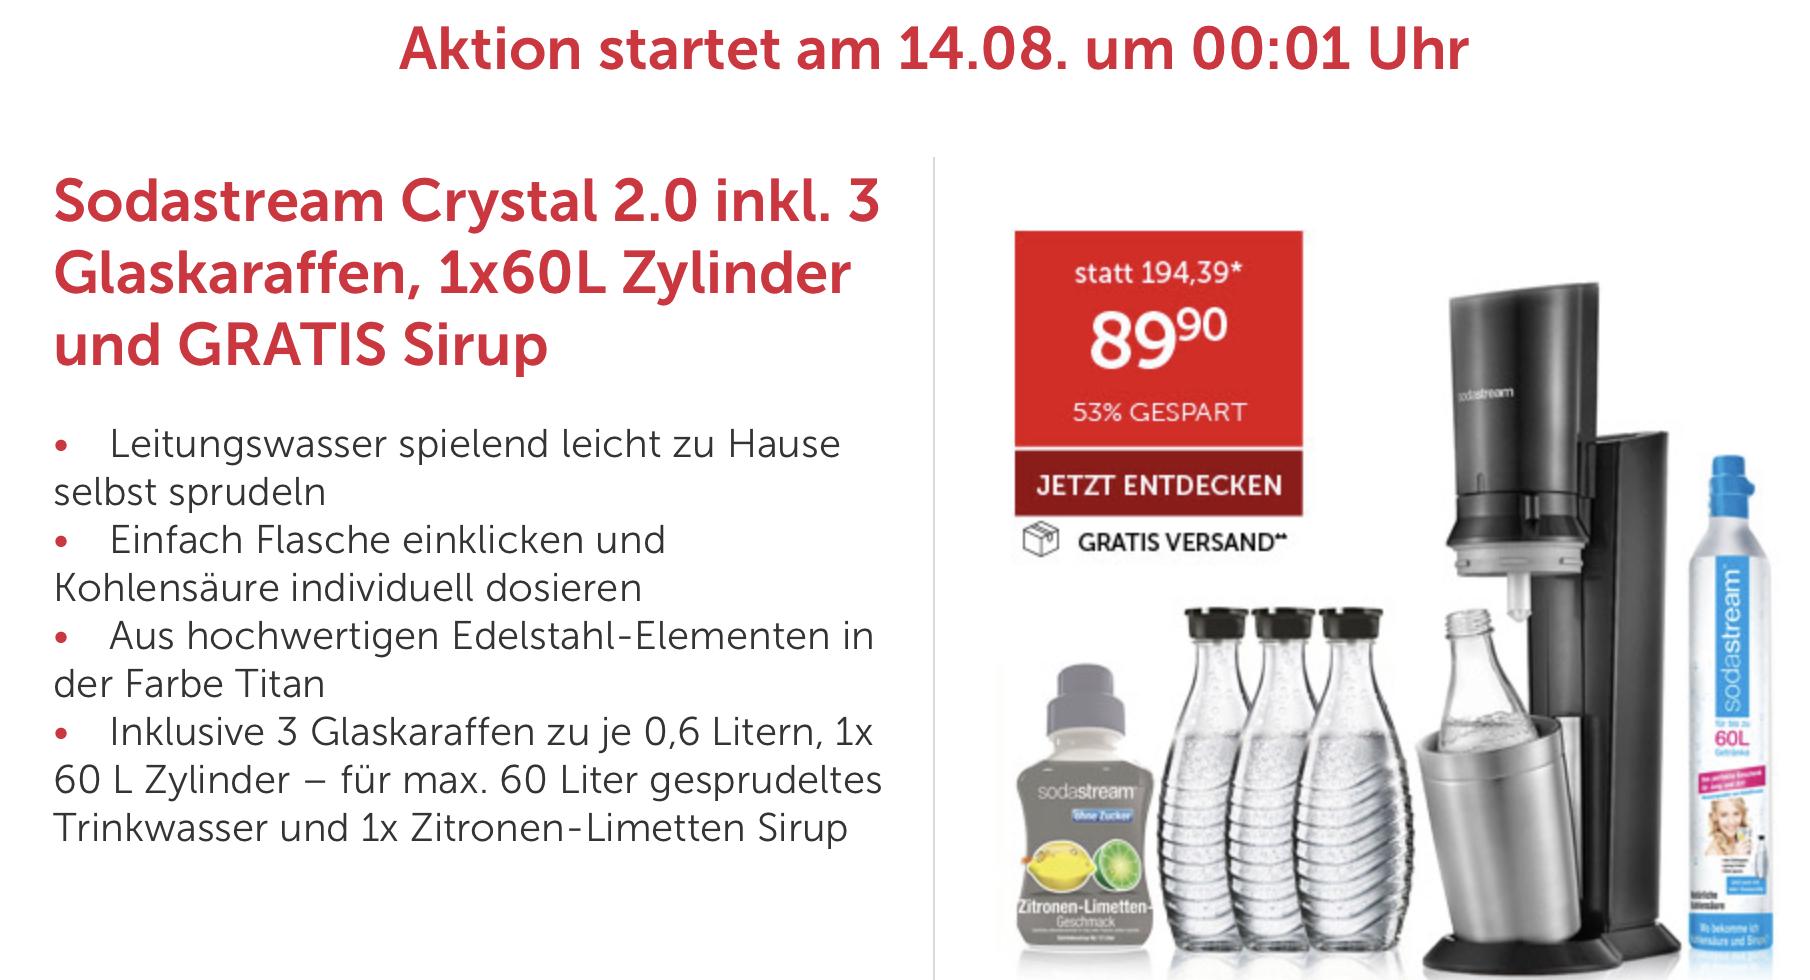 Sodastream Crystal 2 0 Promopack Titan Mit 3 Glaskaraffen U Sirup